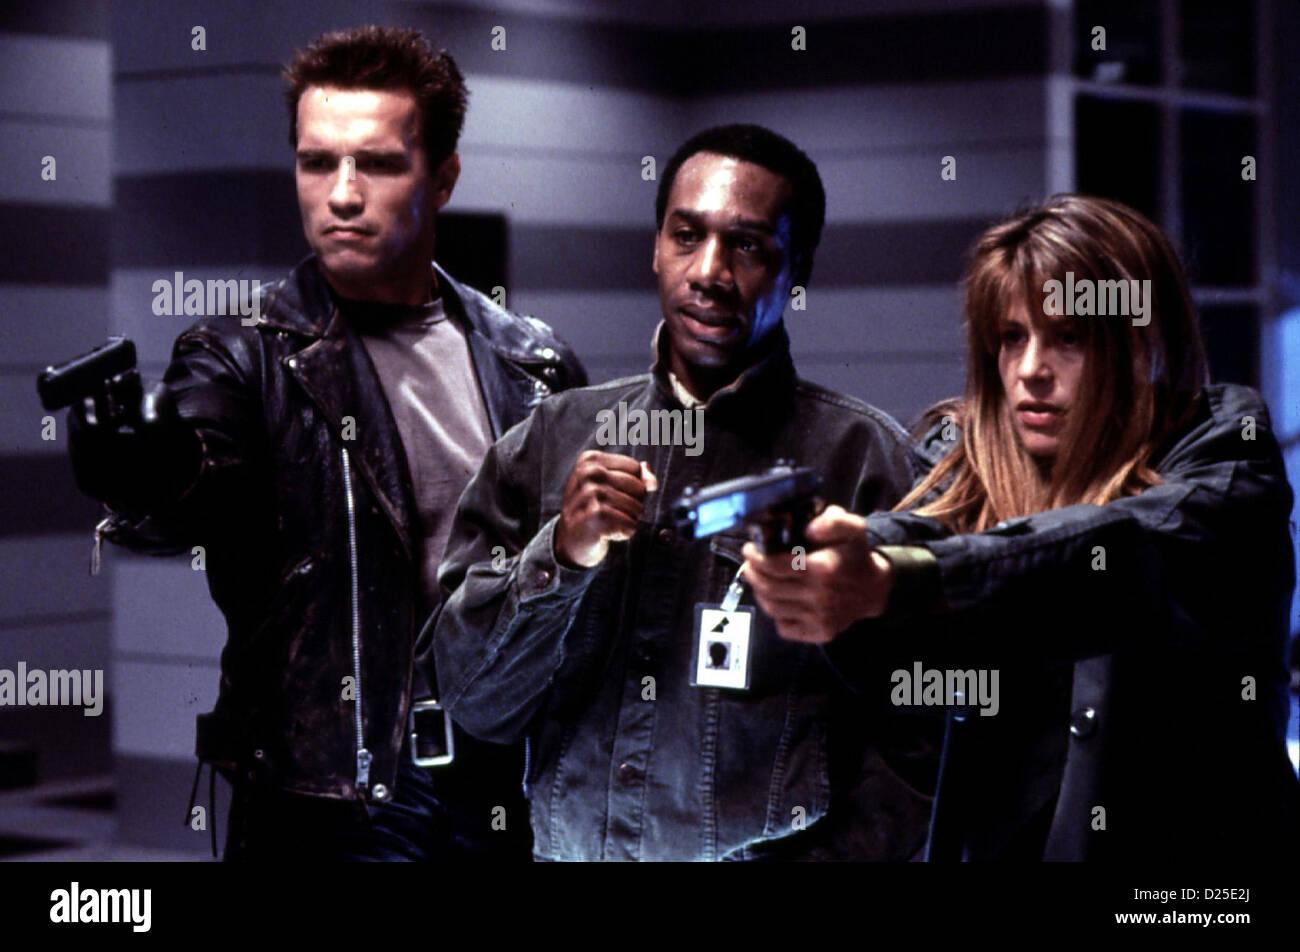 Terminator Ii - Tag Der Abrechnung  Terminator 2: Judgement Day  Arnold Schwarzenegger, Joe Morton, Linda Hamilton - Stock Image